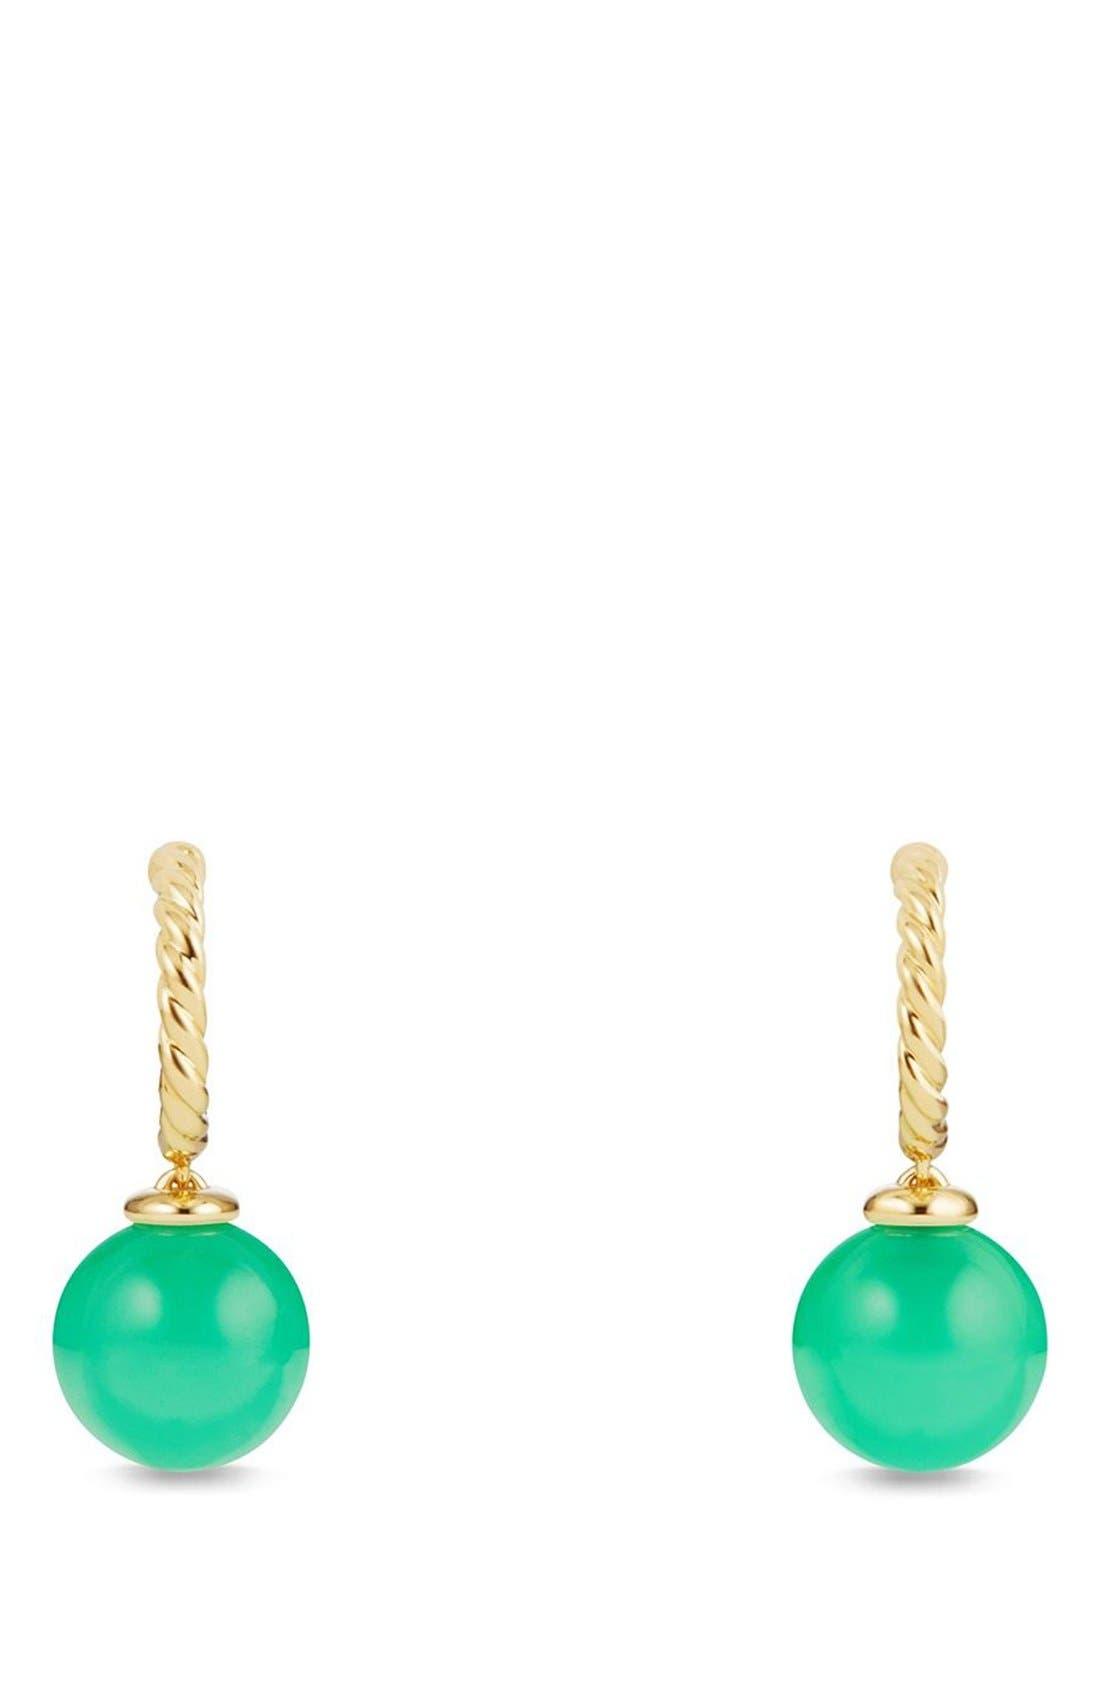 David Yurman 'Solari' Hoop Earrings in 18K Gold